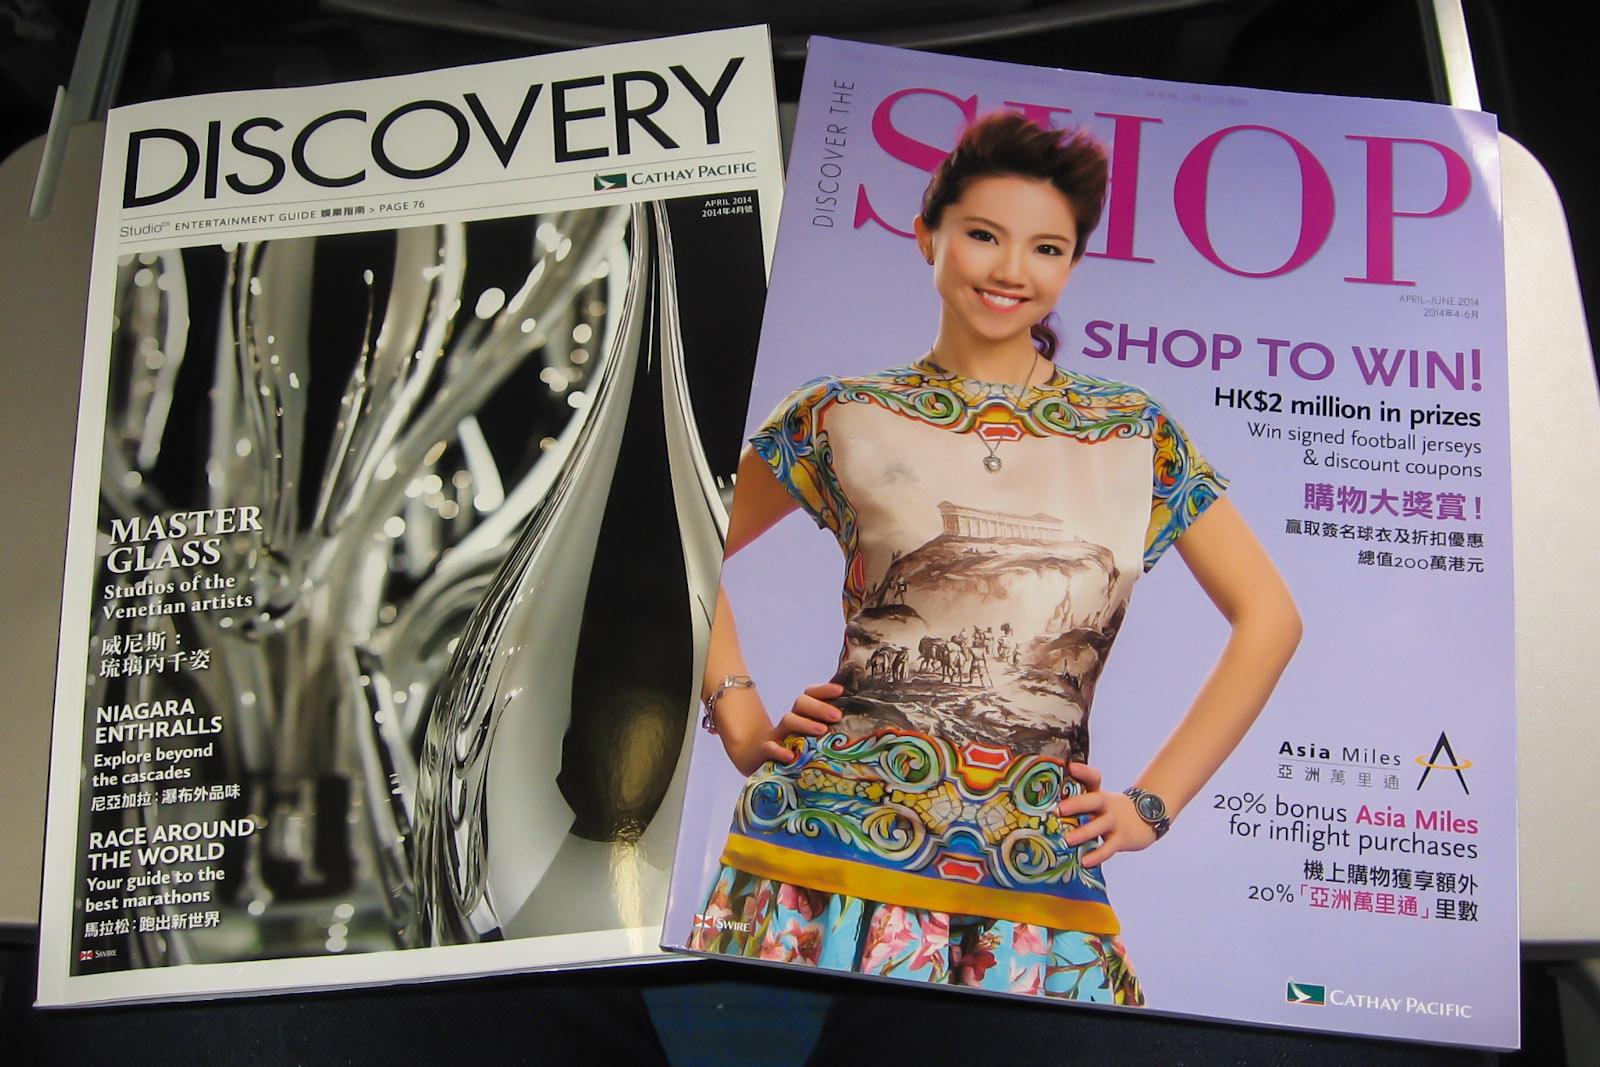 Журналы для пассажиров авиакомпании Cathay Pacific